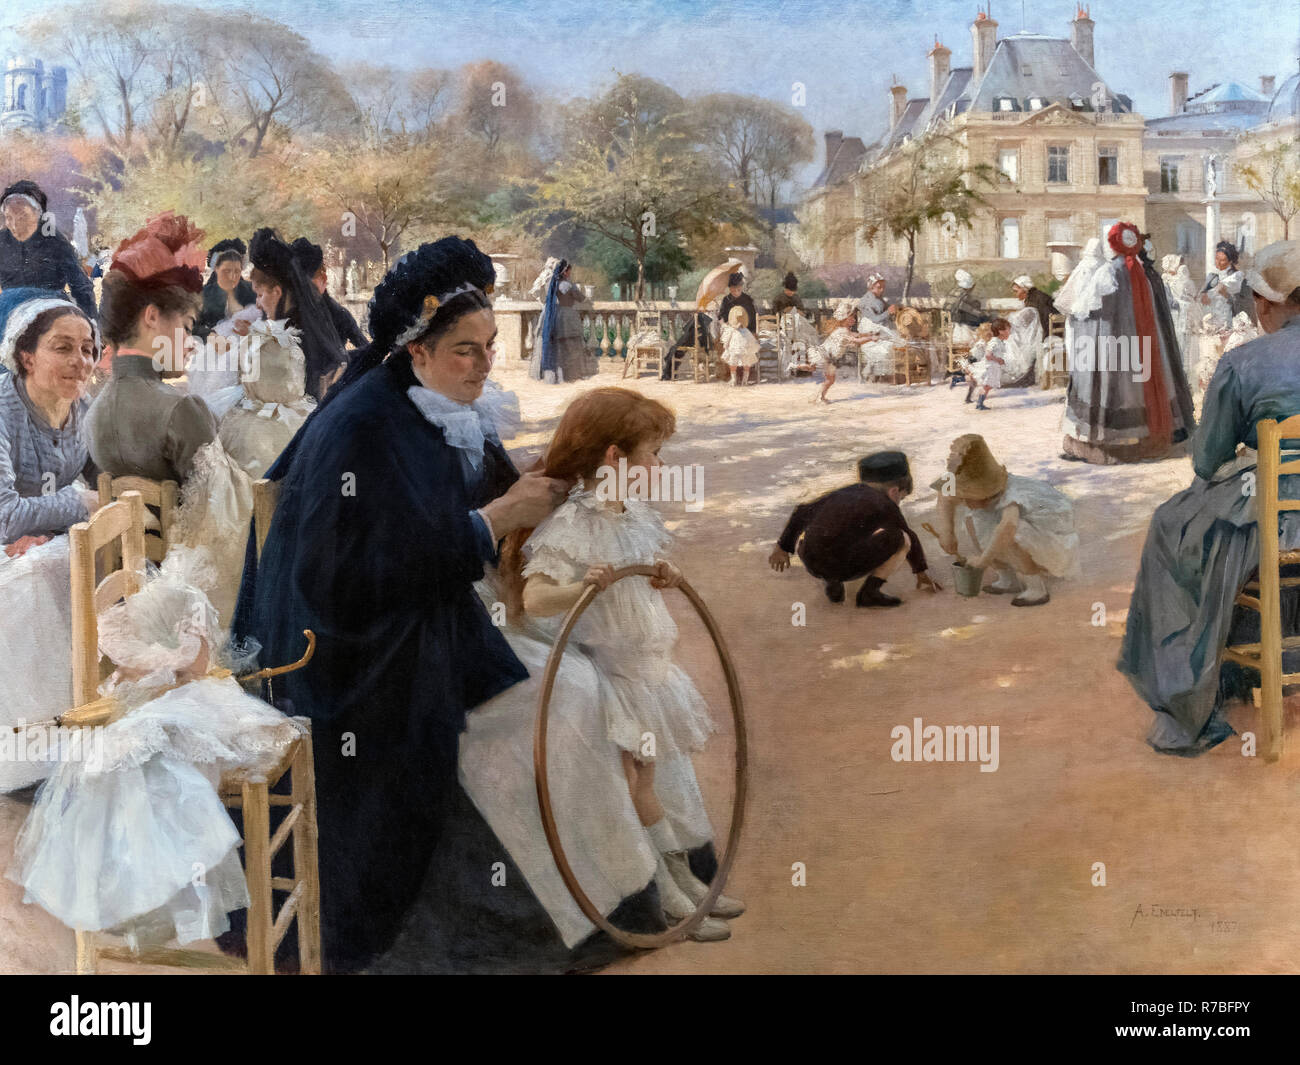 The Luxembourg Gardens, Paris by Albert Gustaf Aristides Edelfelt (1854-1905), oil on canvas, 1887 Stock Photo